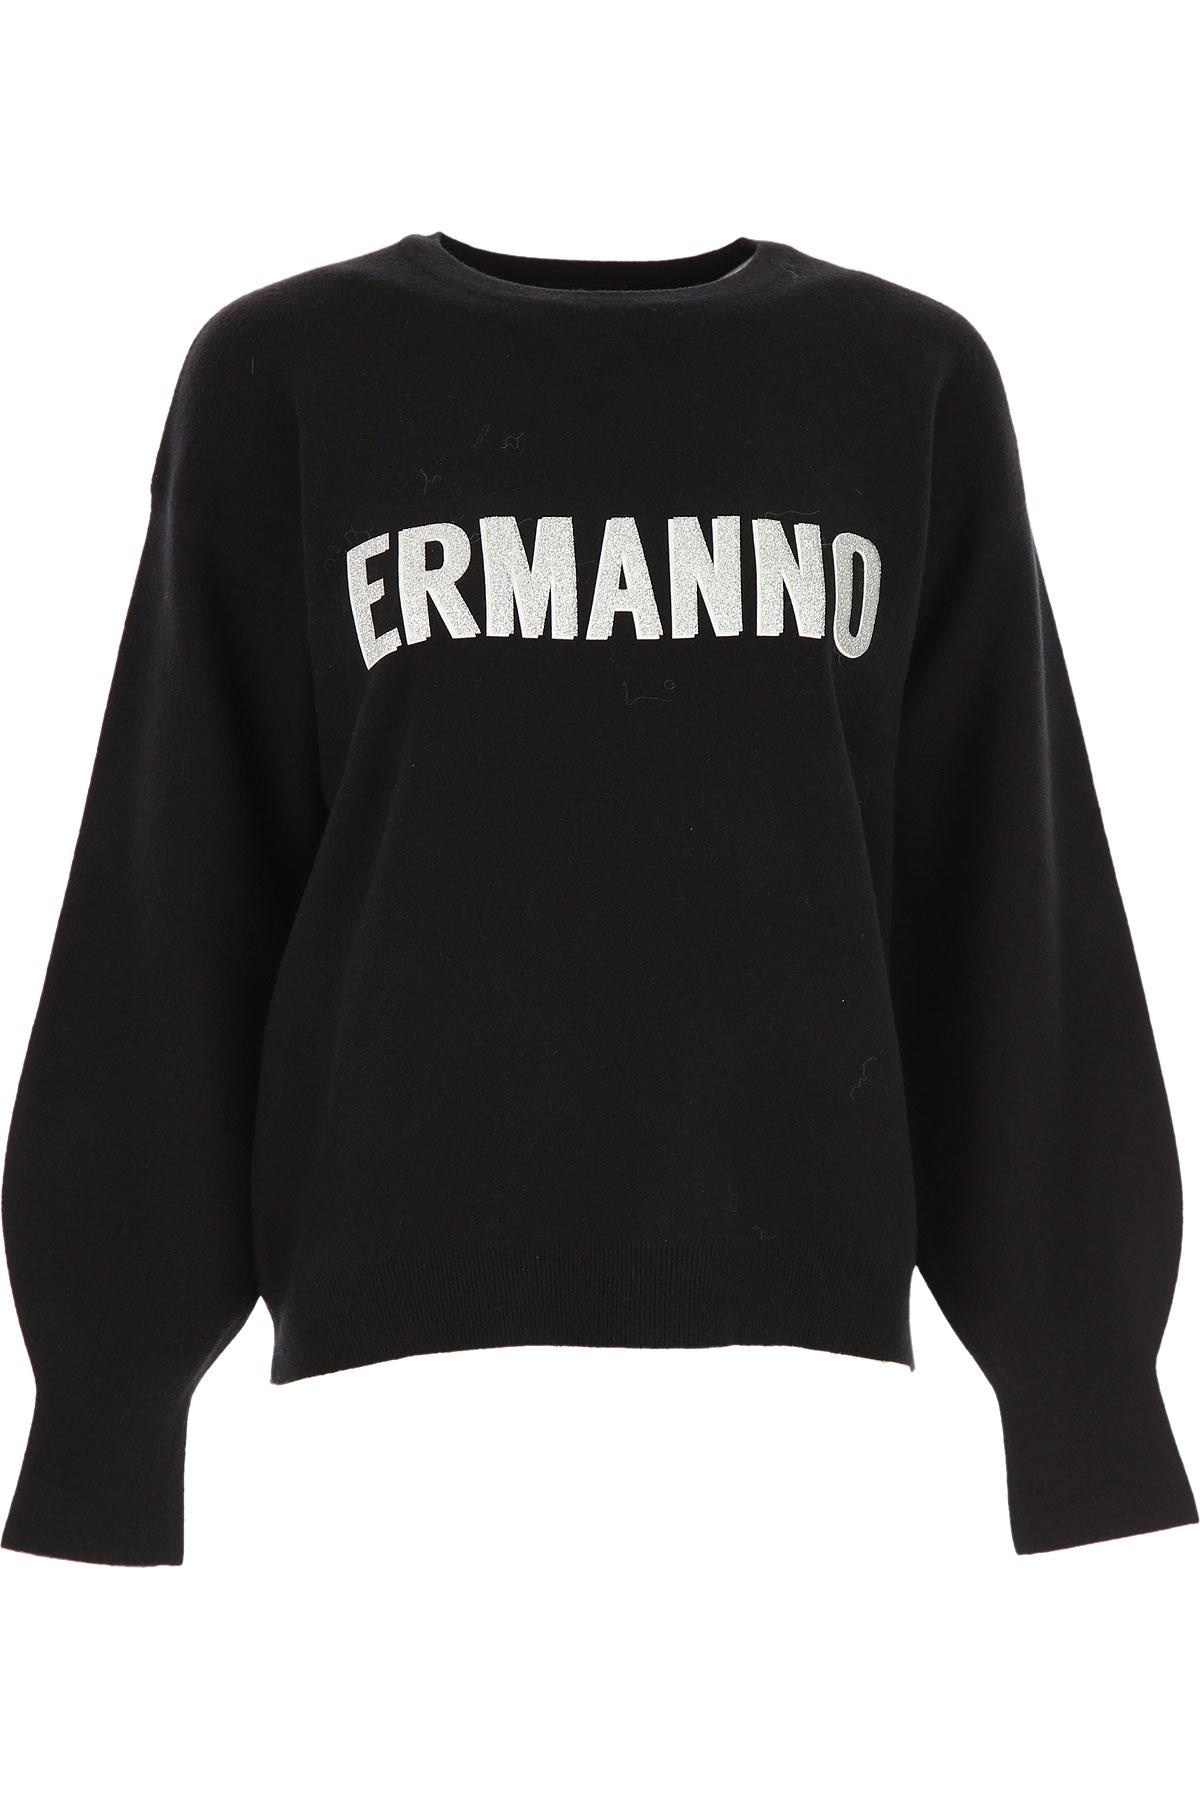 Ermanno Scervino Sweater for Women Jumper On Sale, Black, Viscose, 2019, 4 6 8